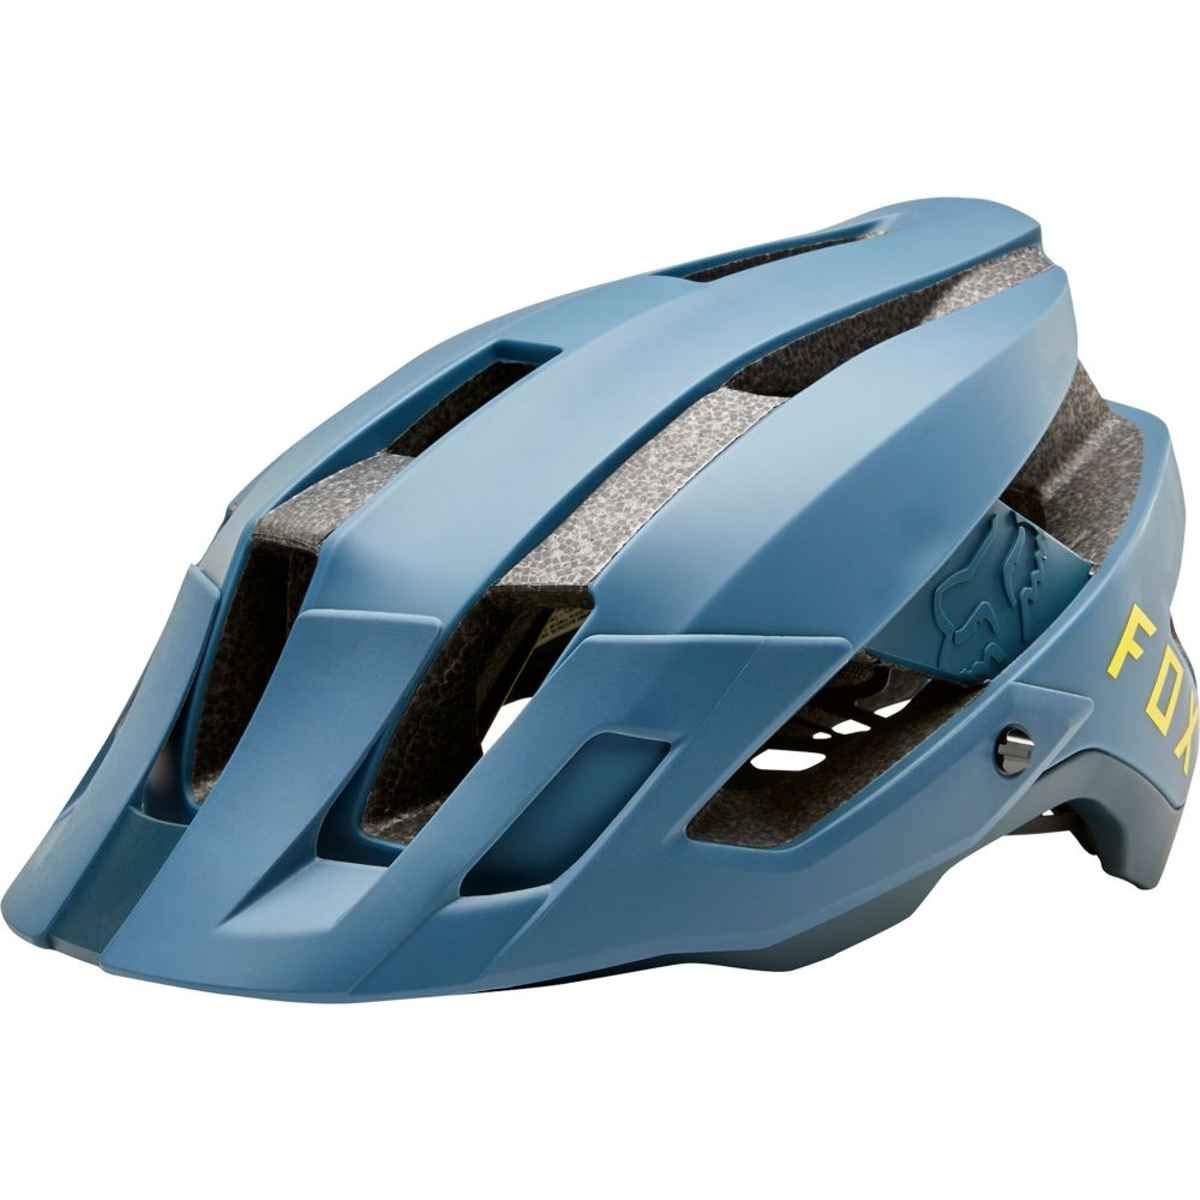 Fox Flux Mountain Bike Helmet blue steel, Large/X-Large FOX HEAD EUROPE S.L.U. 20106-305-L/XL